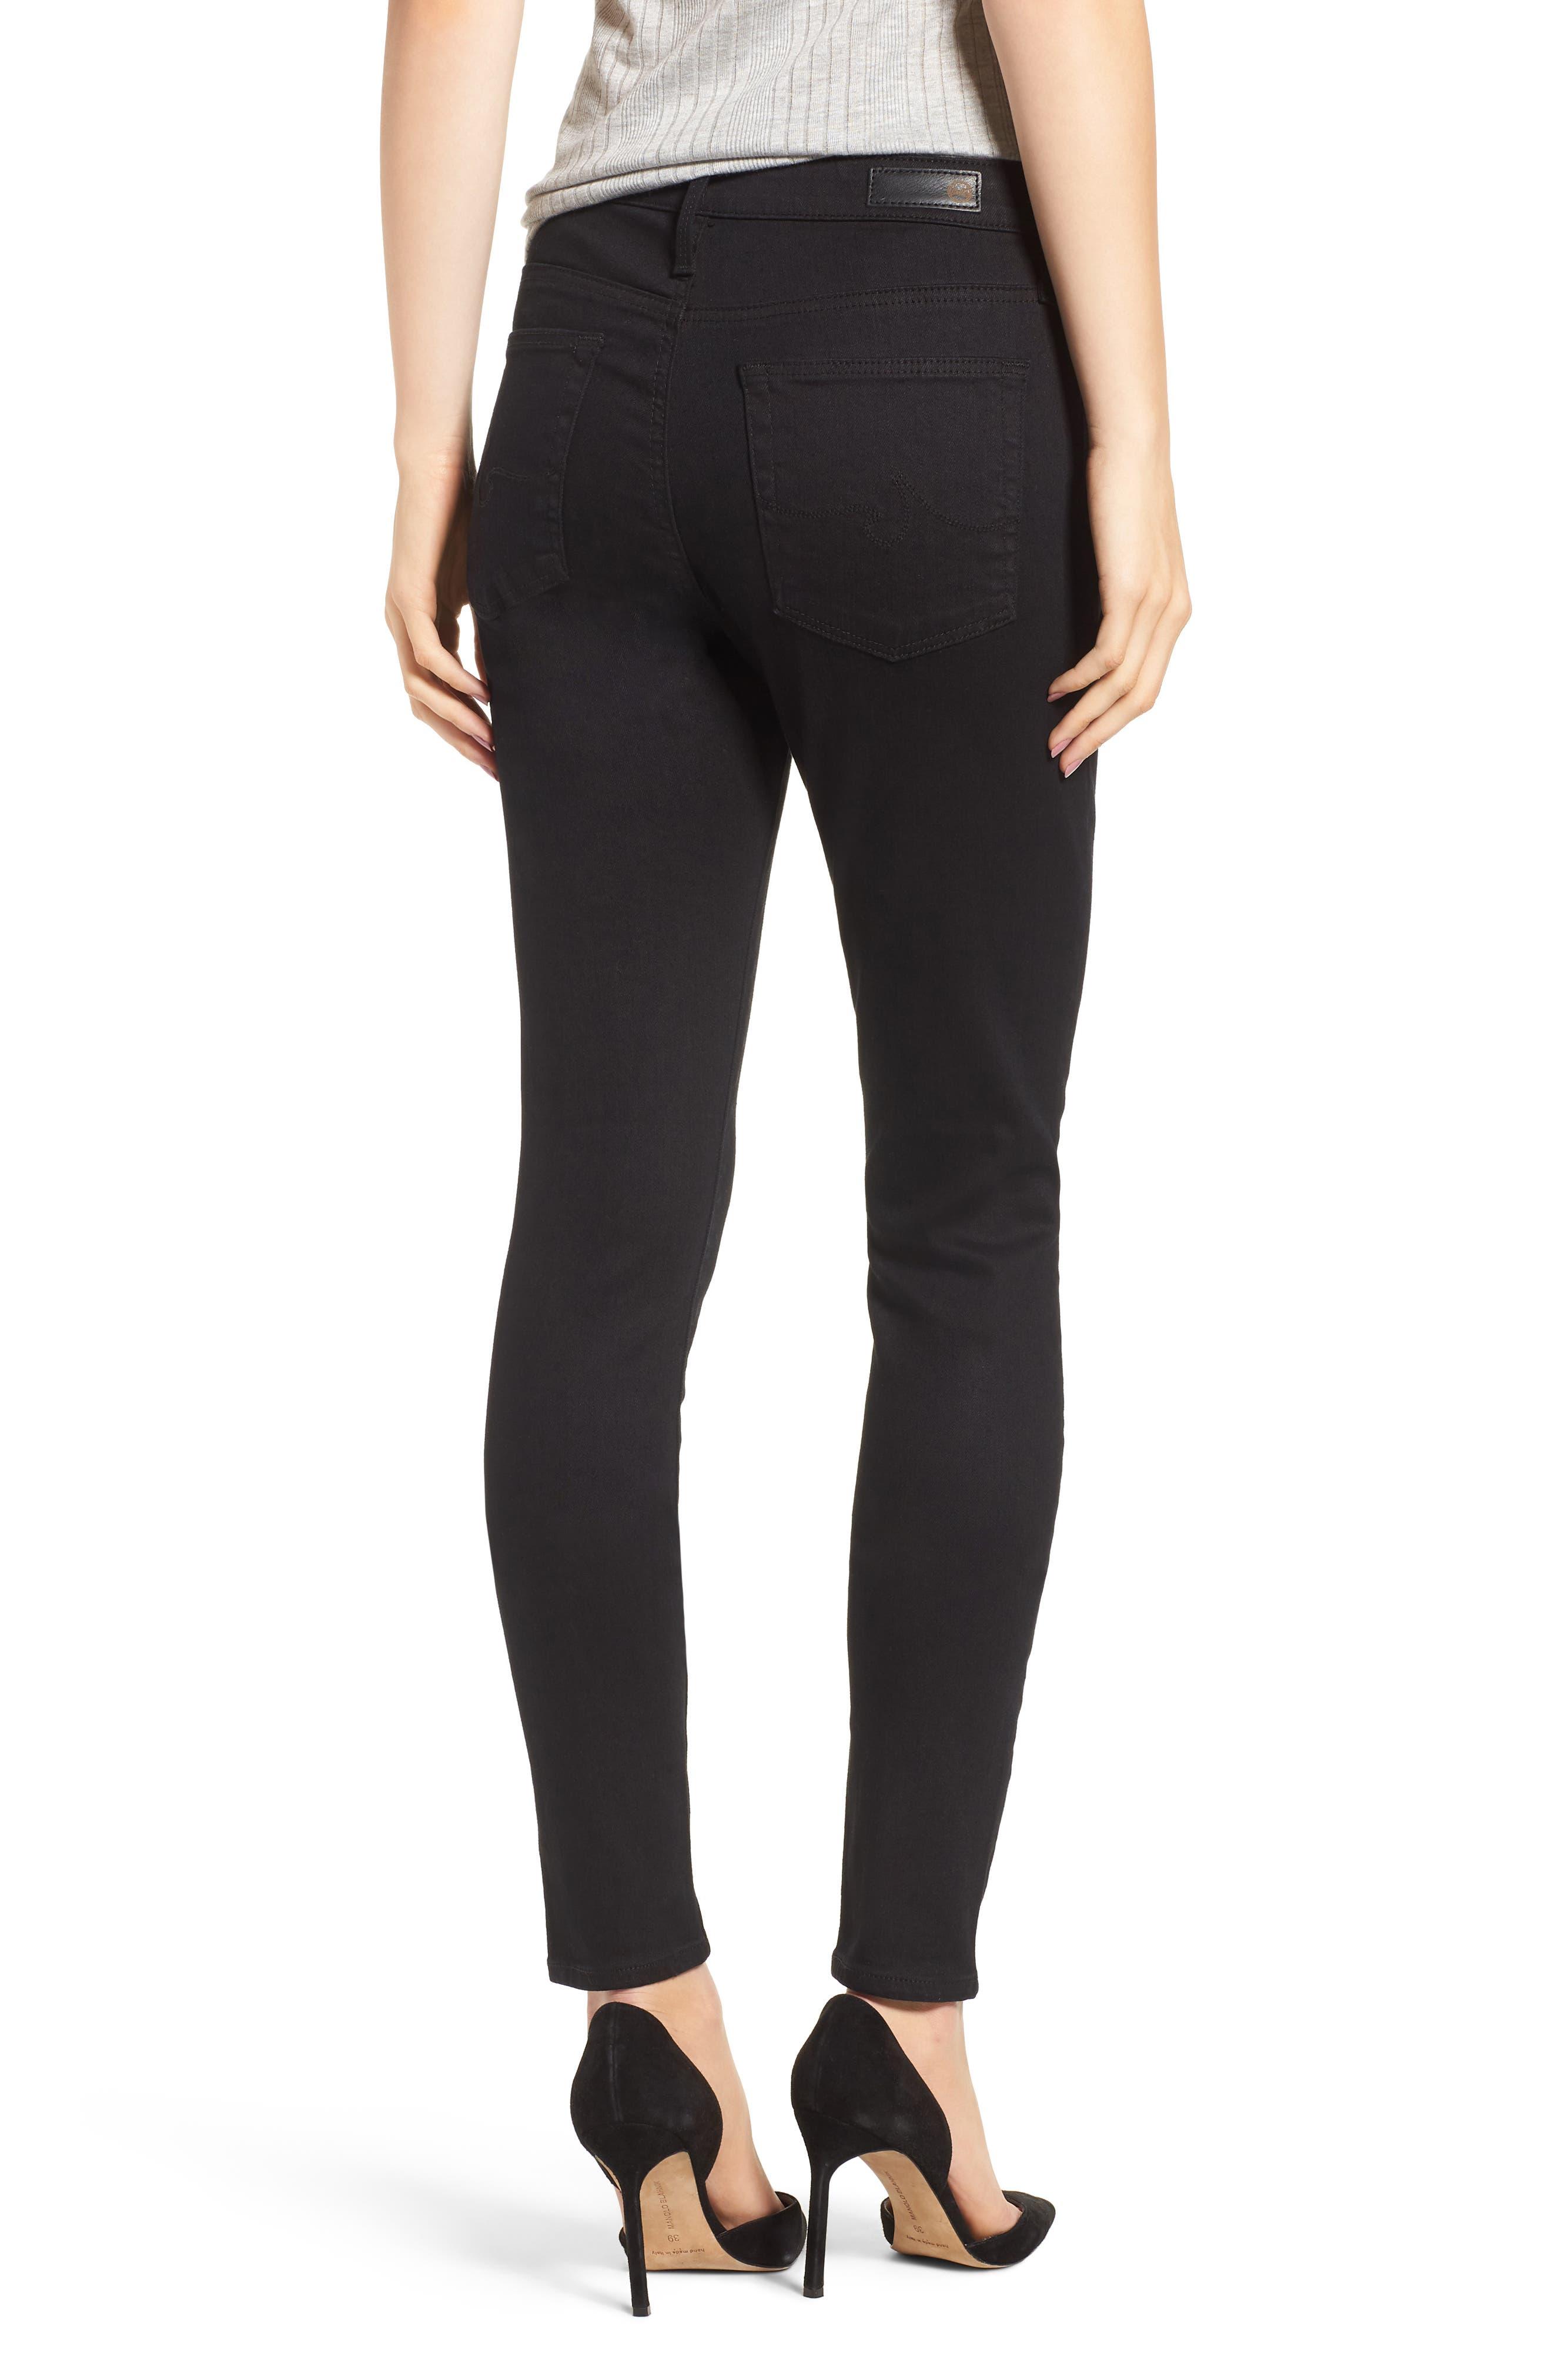 'The Farrah' High Rise Skinny Jeans,                             Alternate thumbnail 2, color,                             Overdyed Black